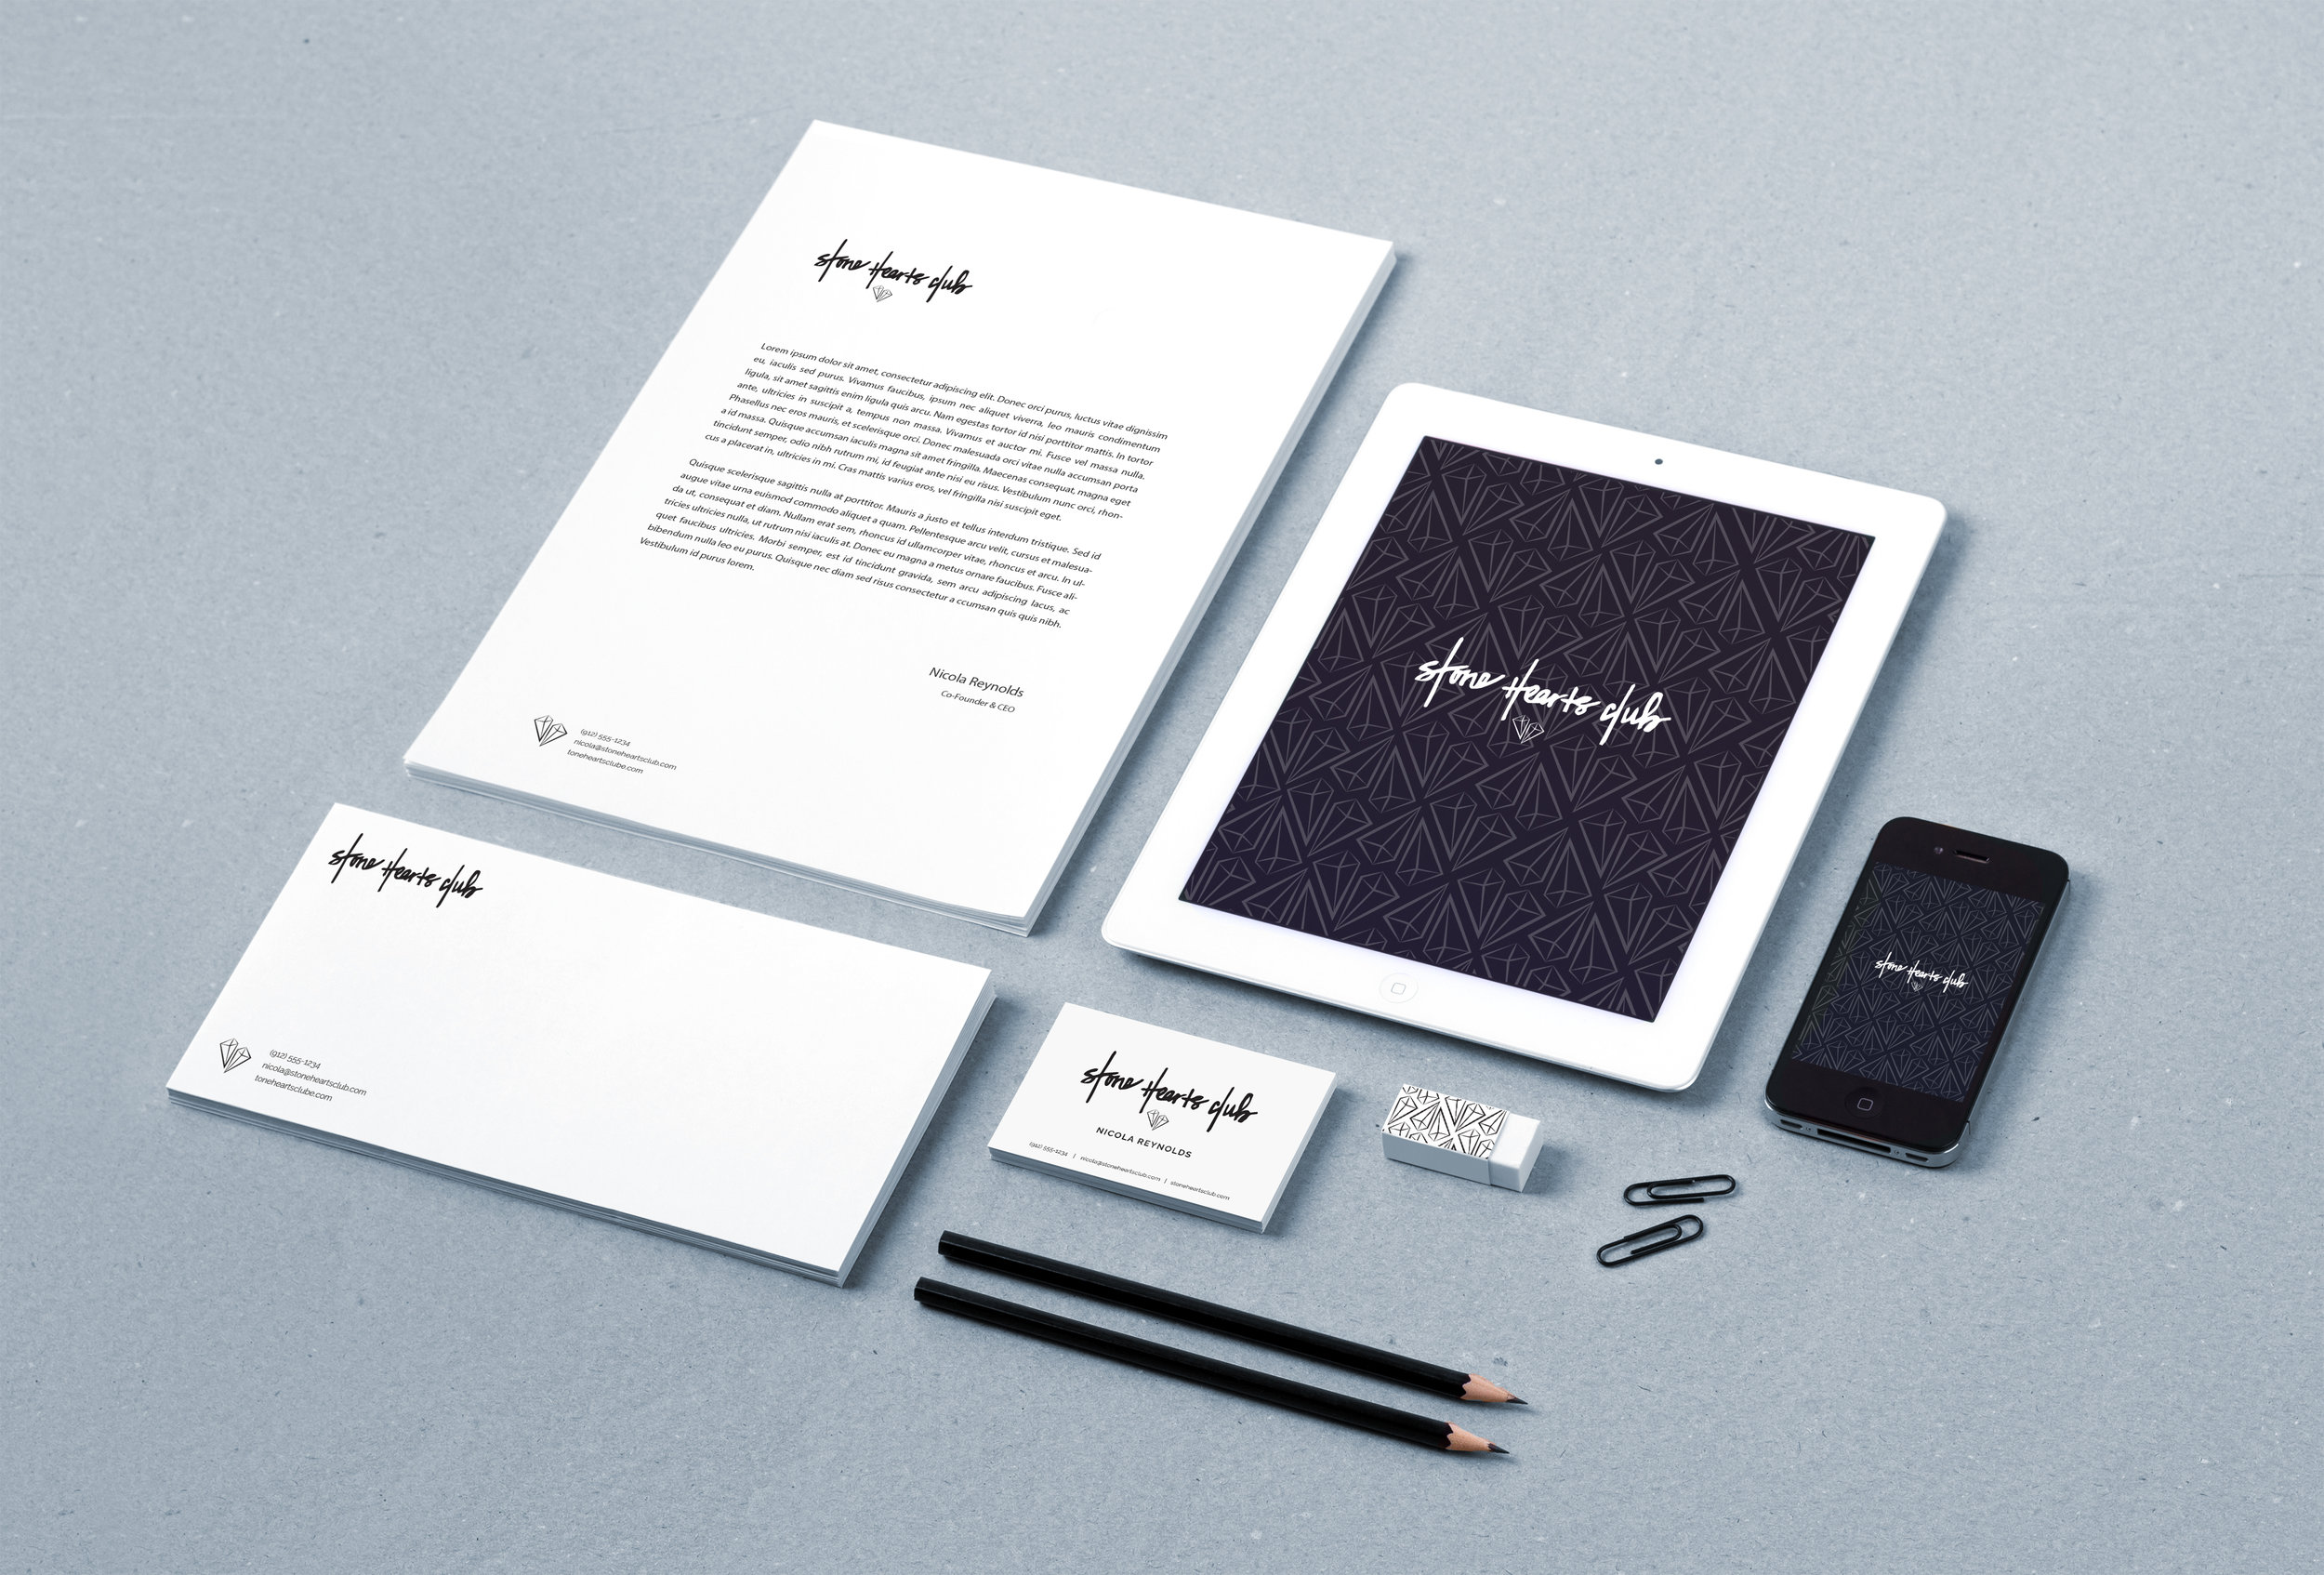 SHC-Branding Identity MockUp Vol8.jpg